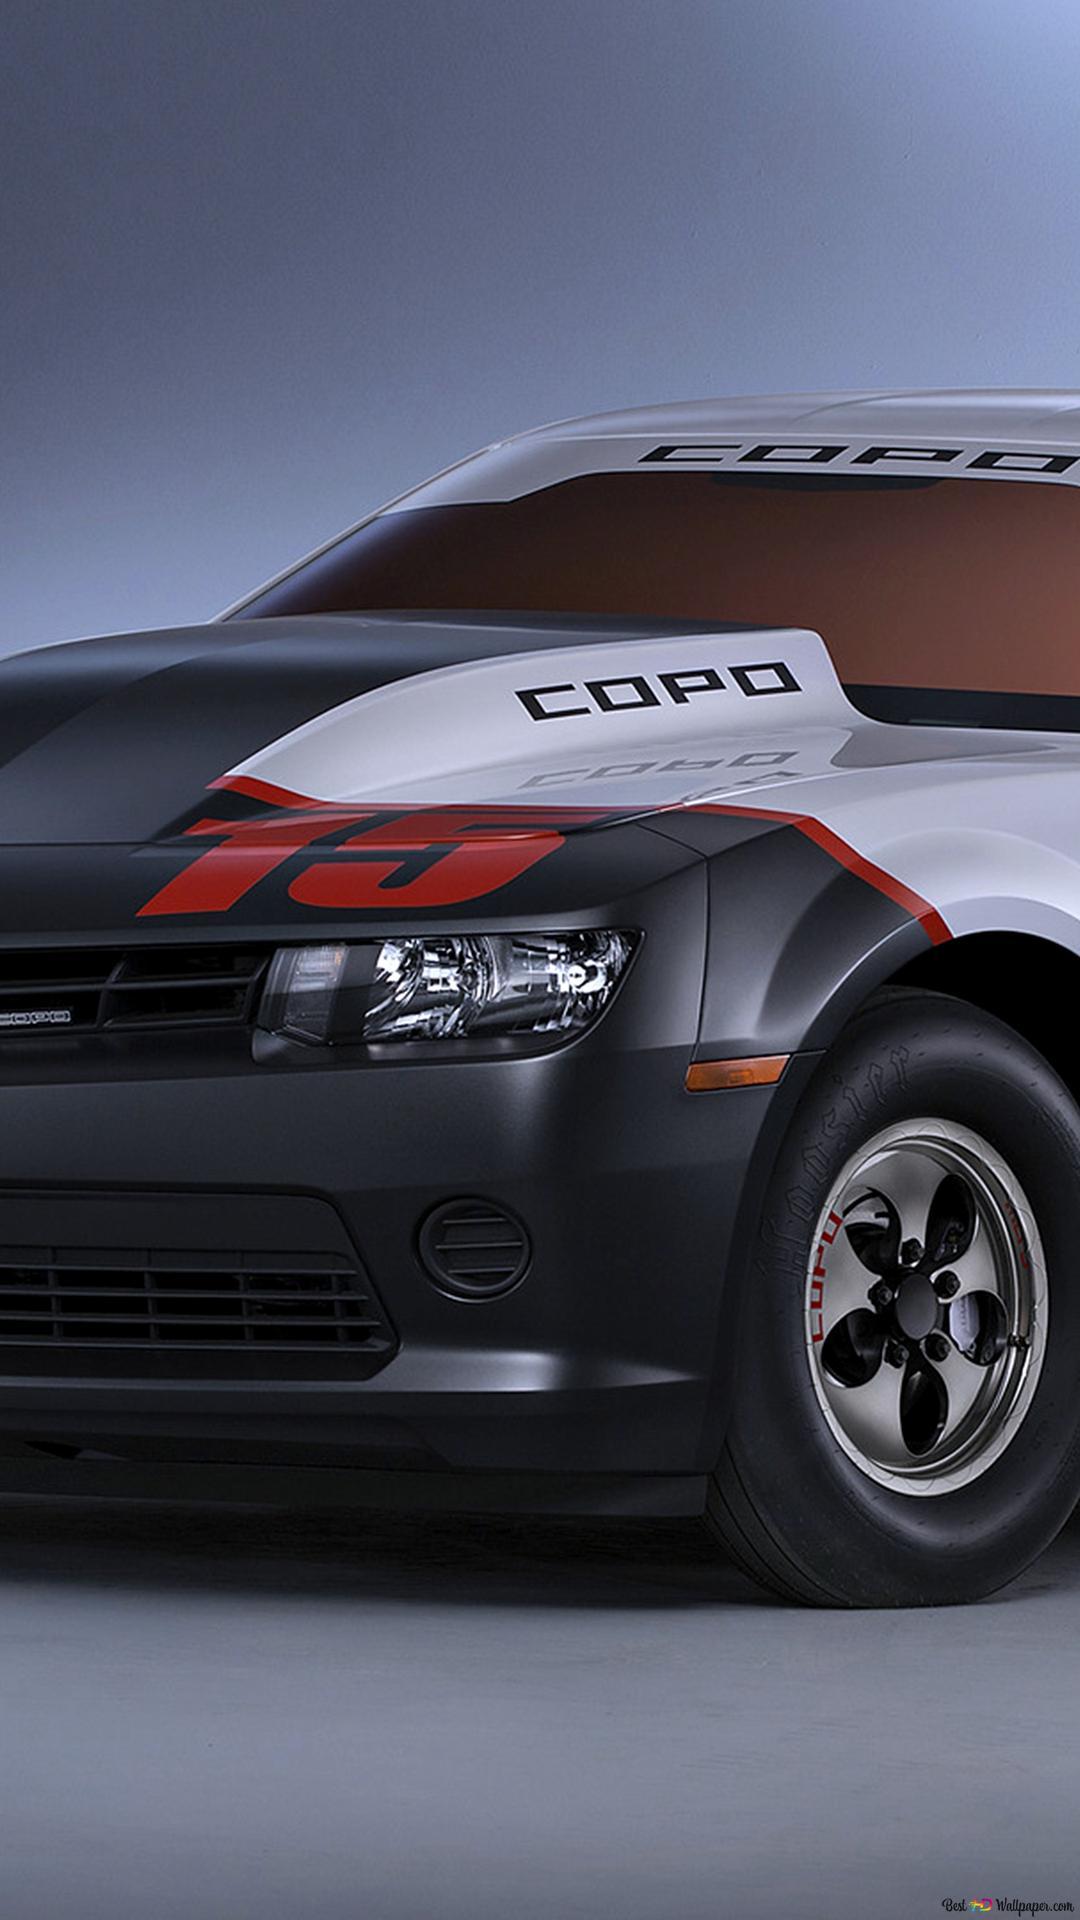 2019 Chevy Copo Camaro Hd Wallpaper Download